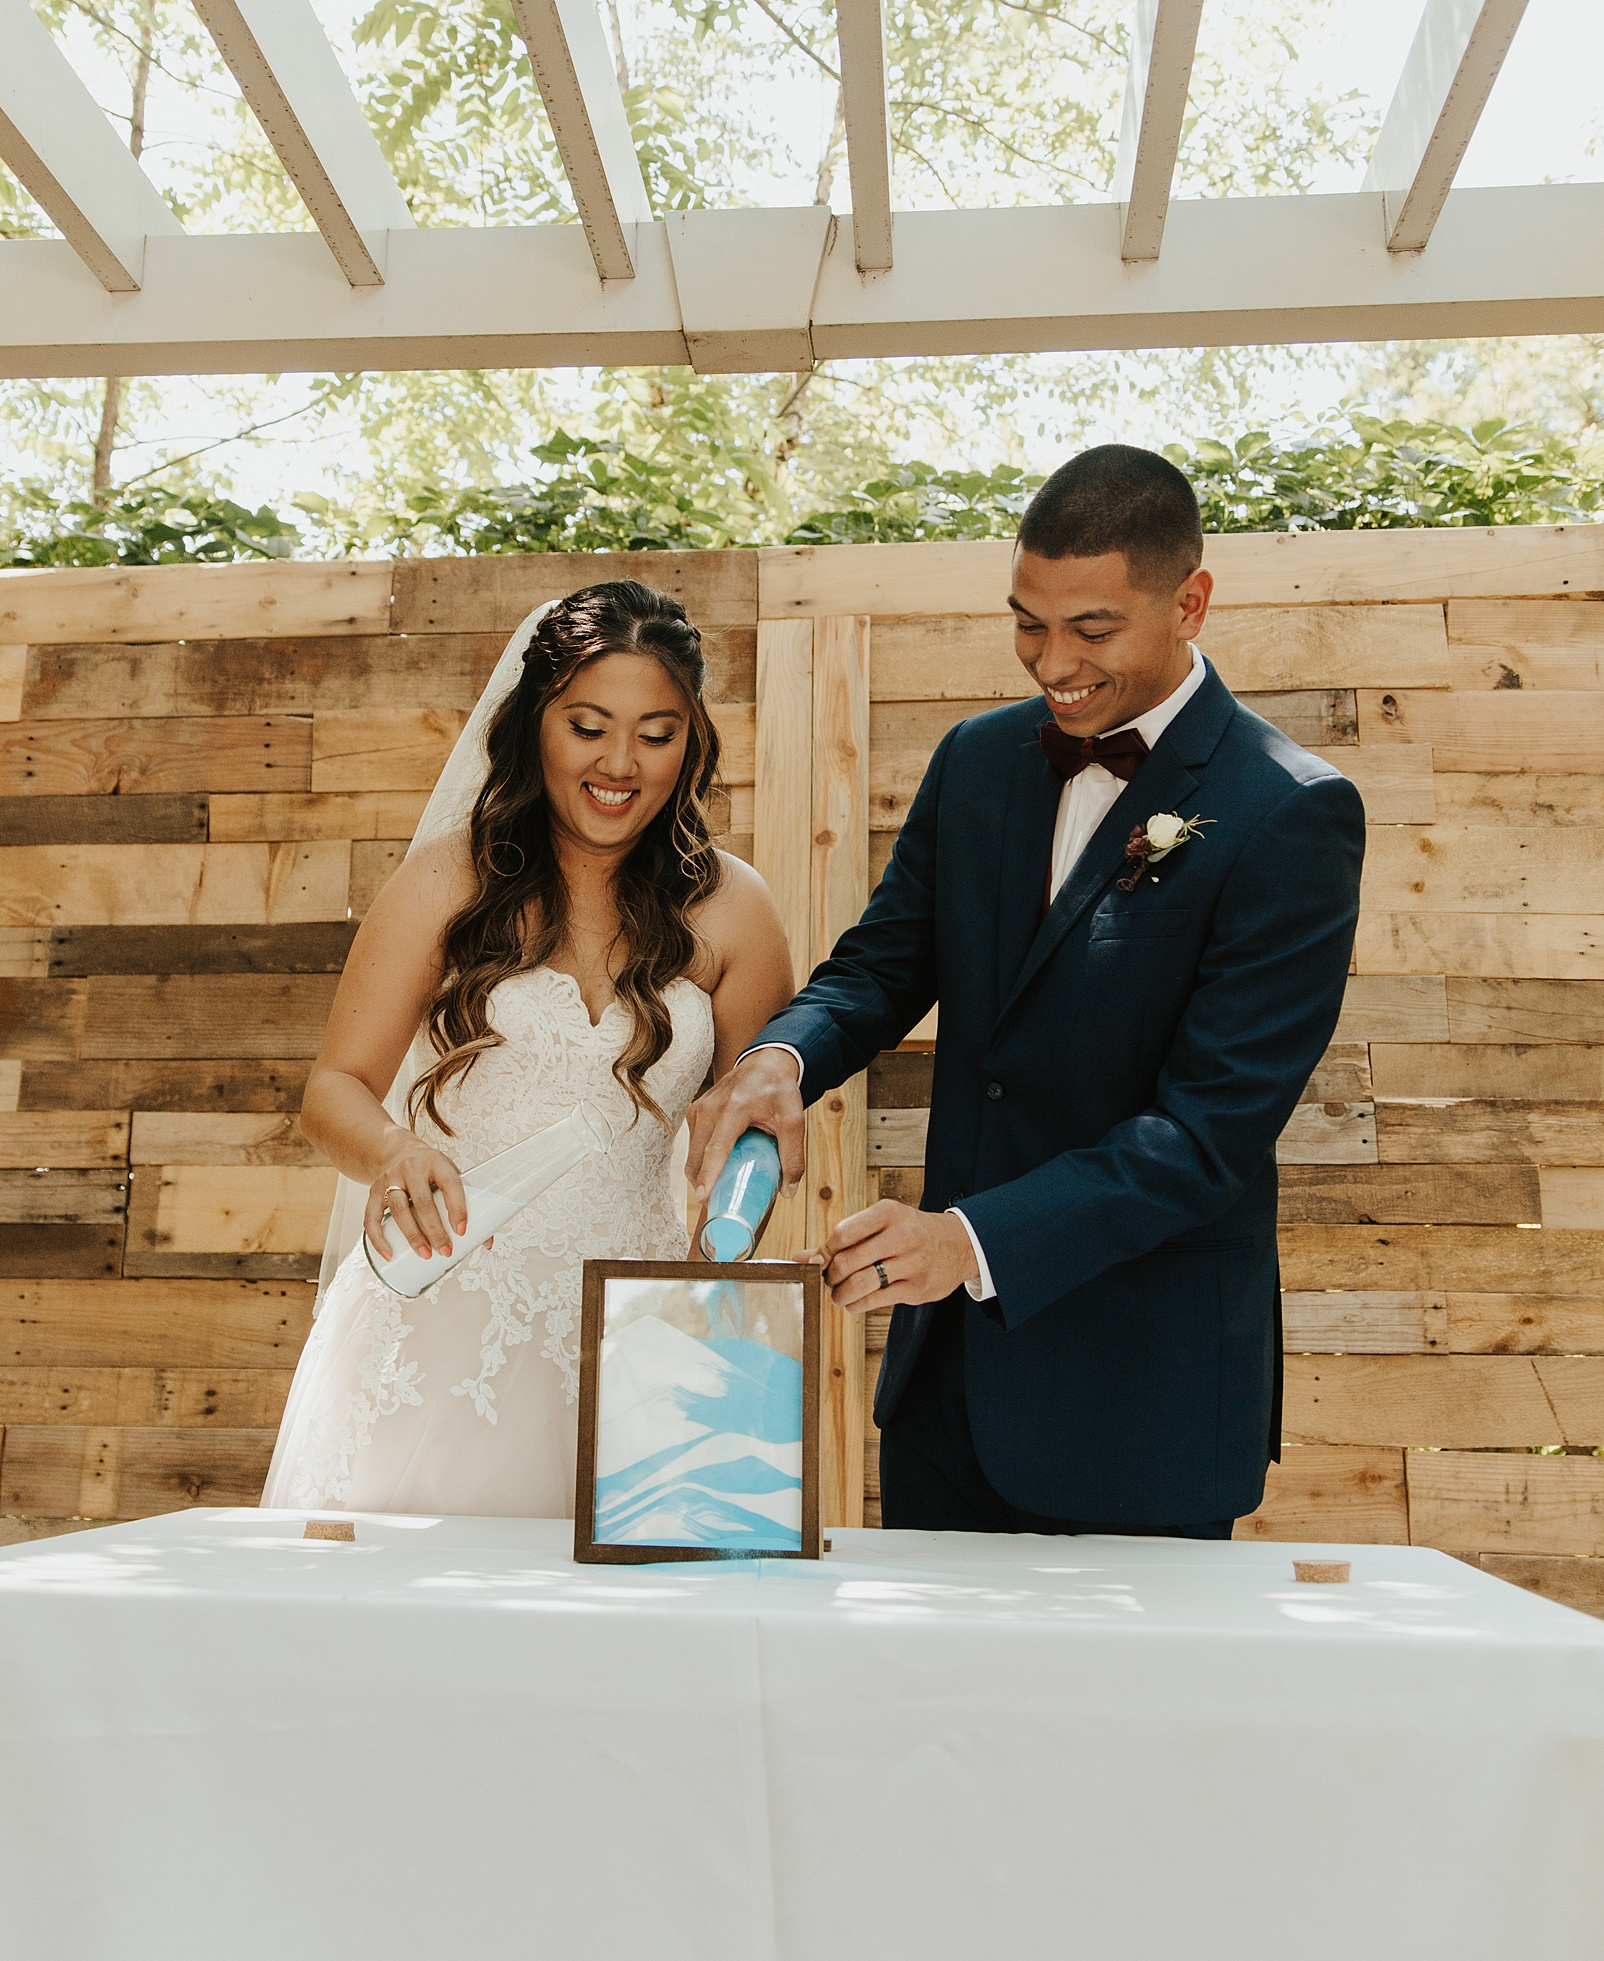 wedding ceremony traditions